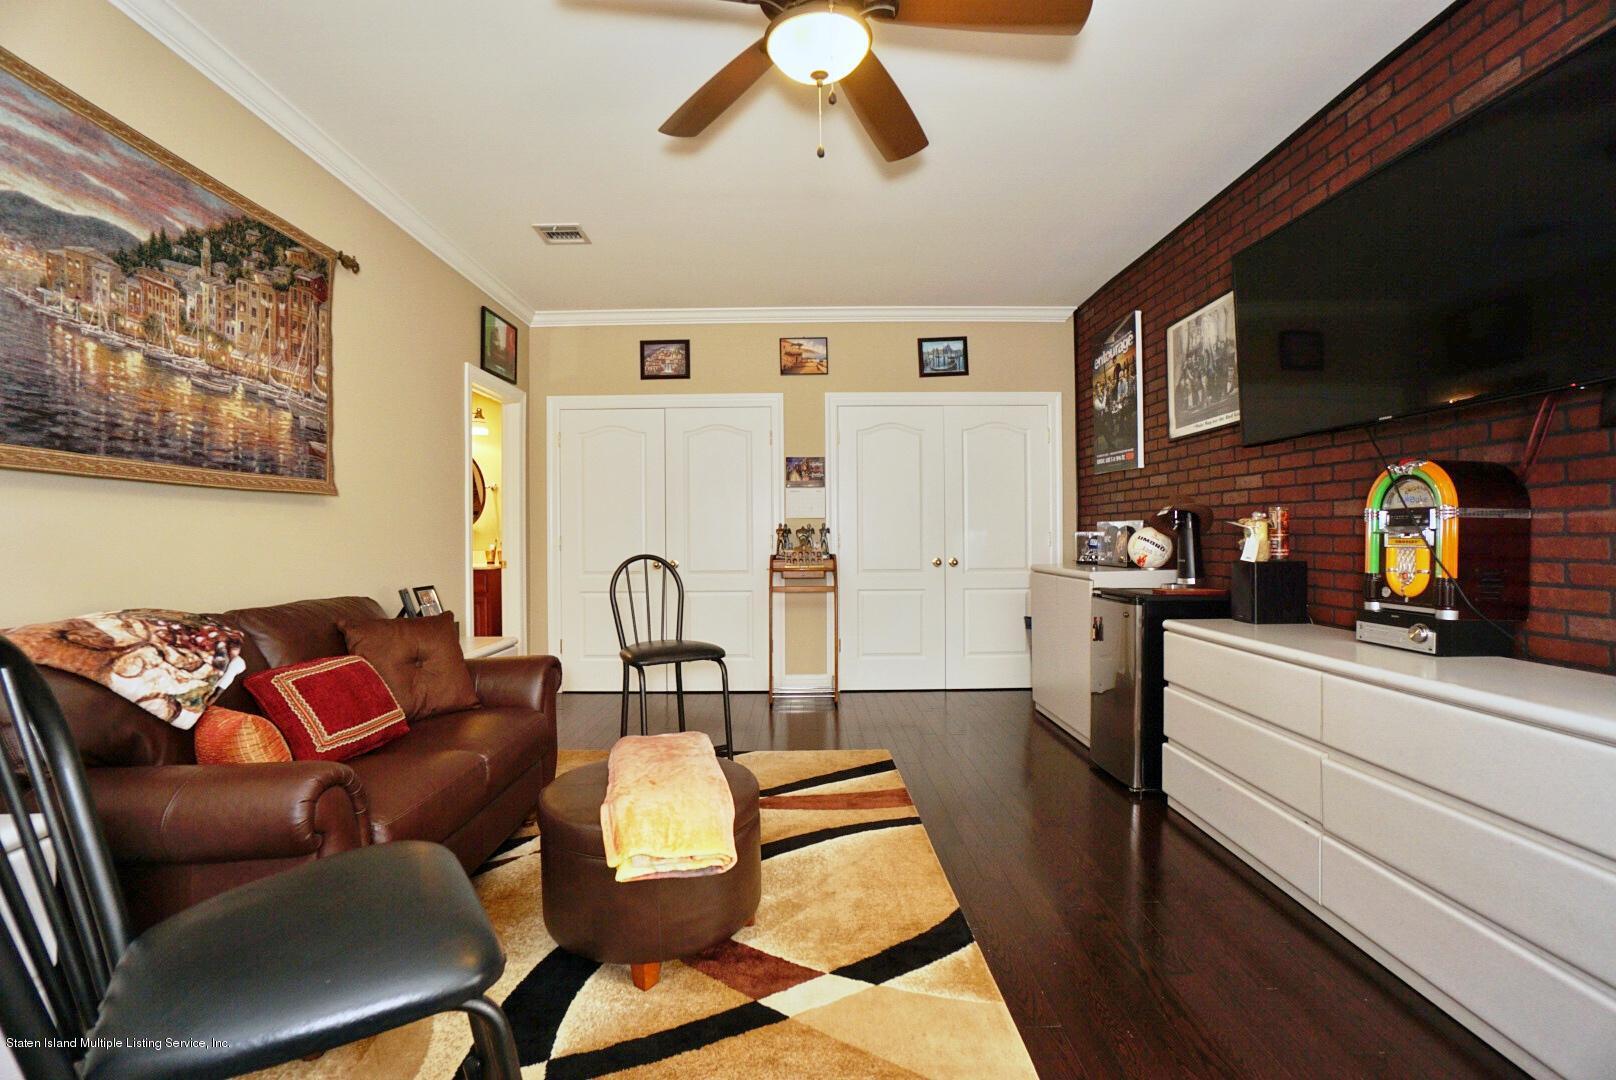 Single Family - Attached 80 Pilot Lane  Staten Island, NY 10309, MLS-1140636-14